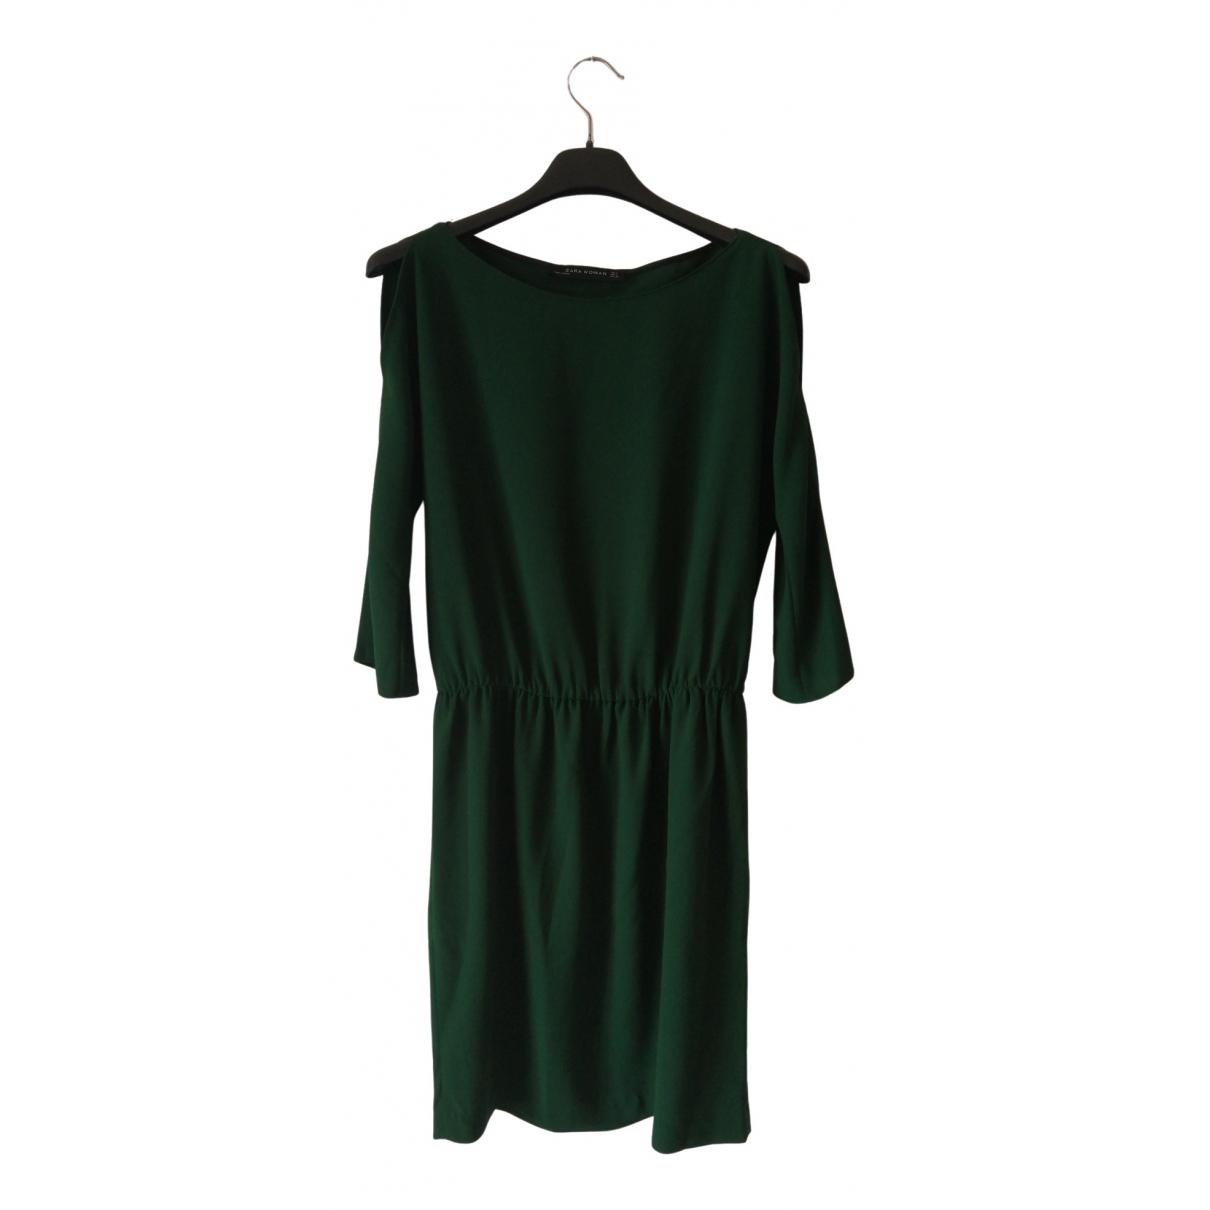 Zara \N Kleid in  Gruen Polyester